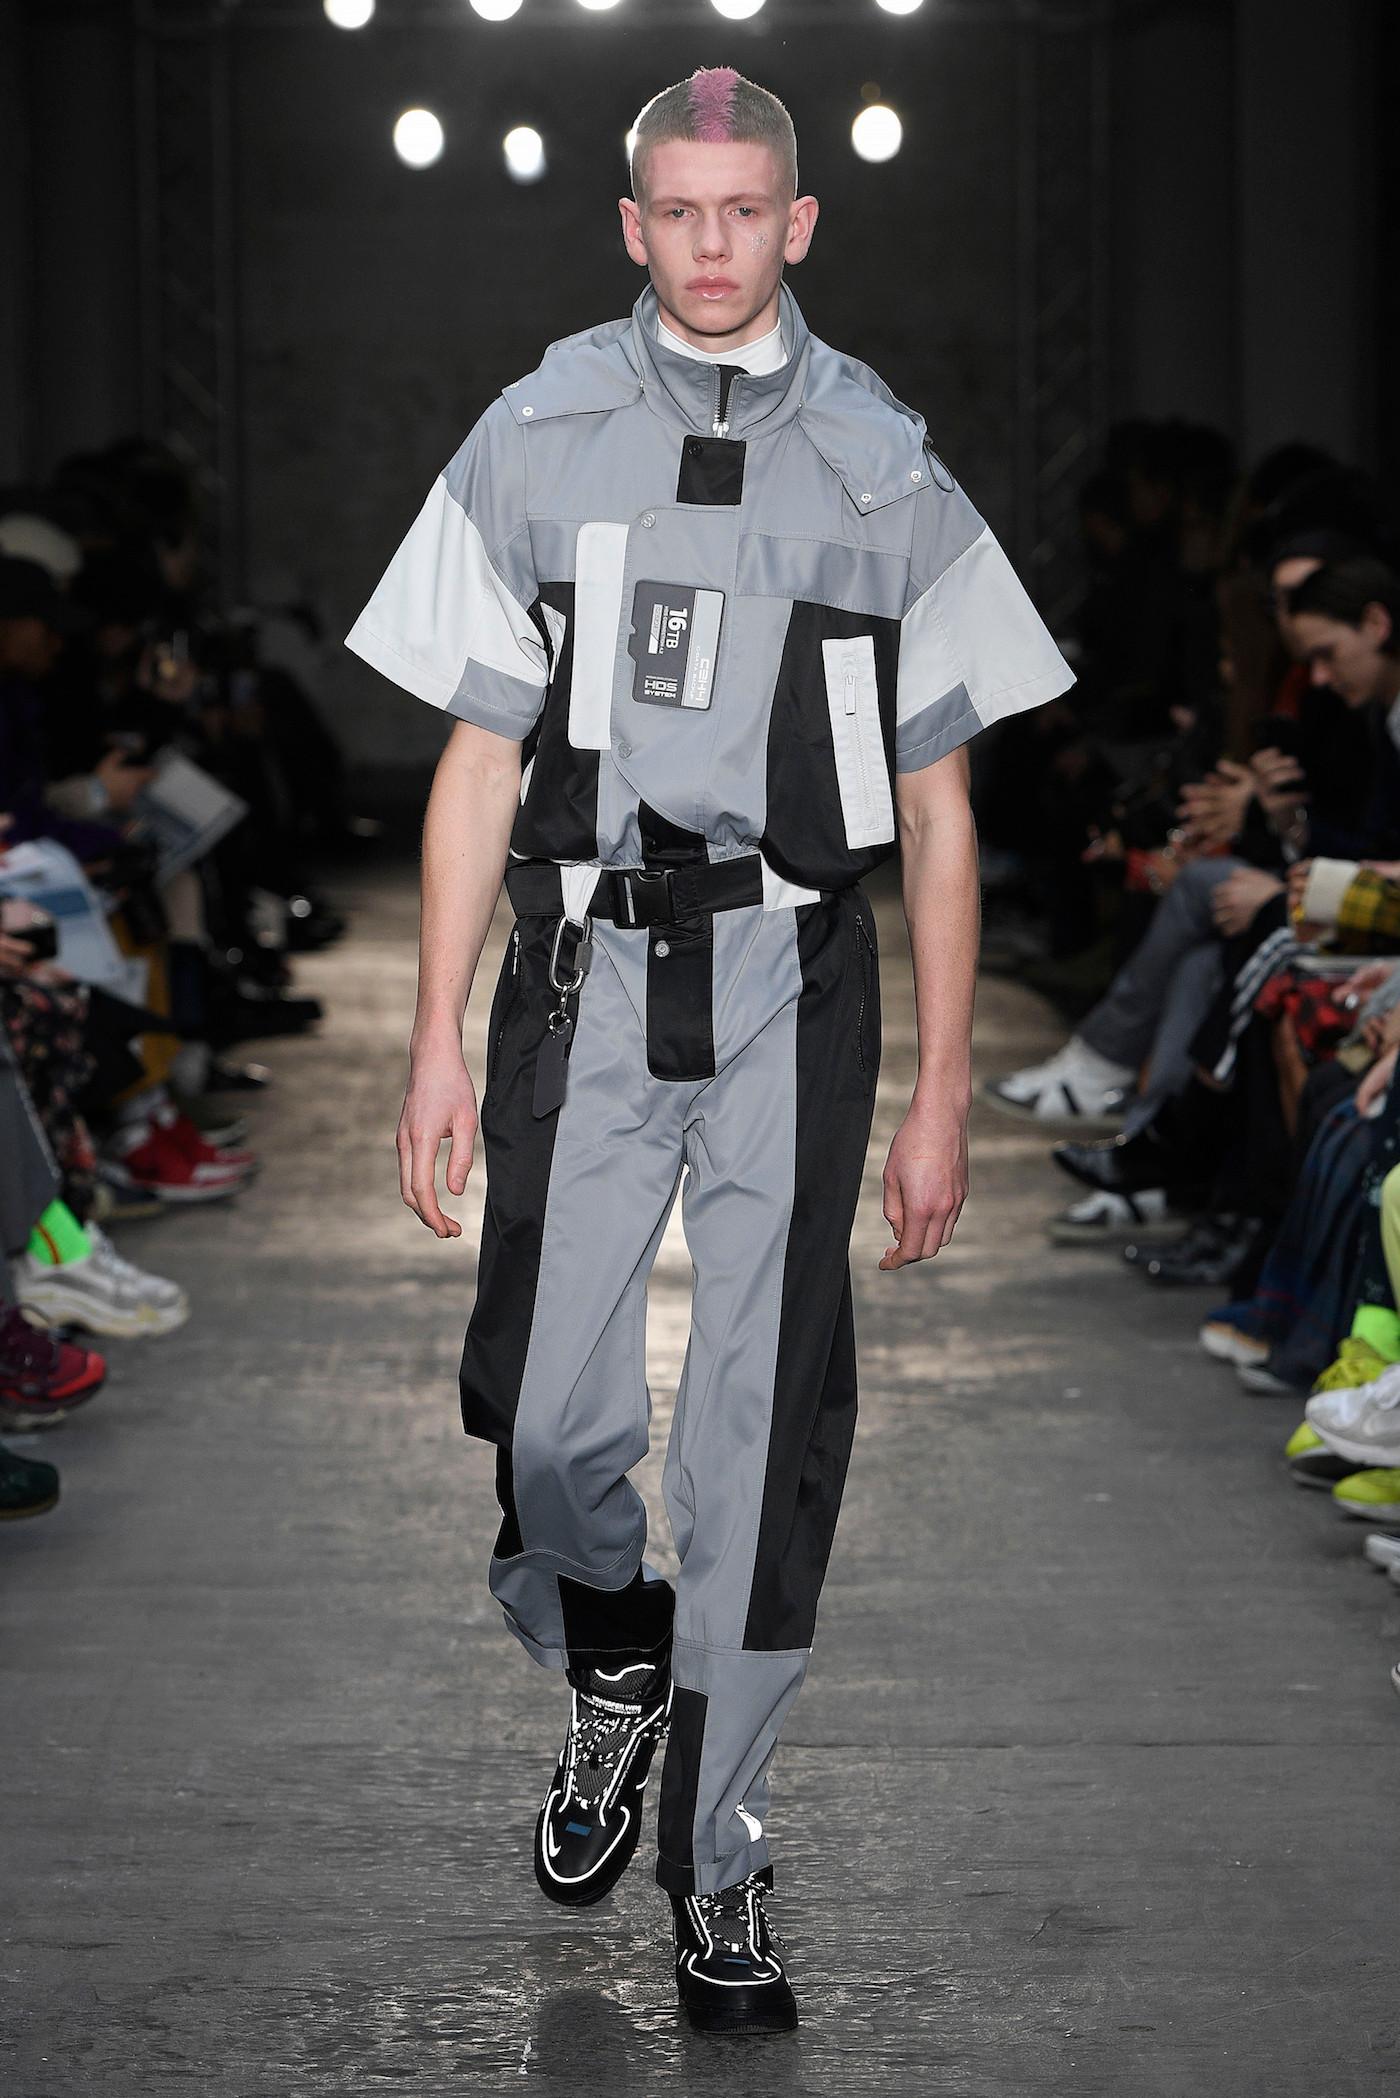 C2H4 London Menswear Fashion Week Fall Winter 2019 London Jan 2019